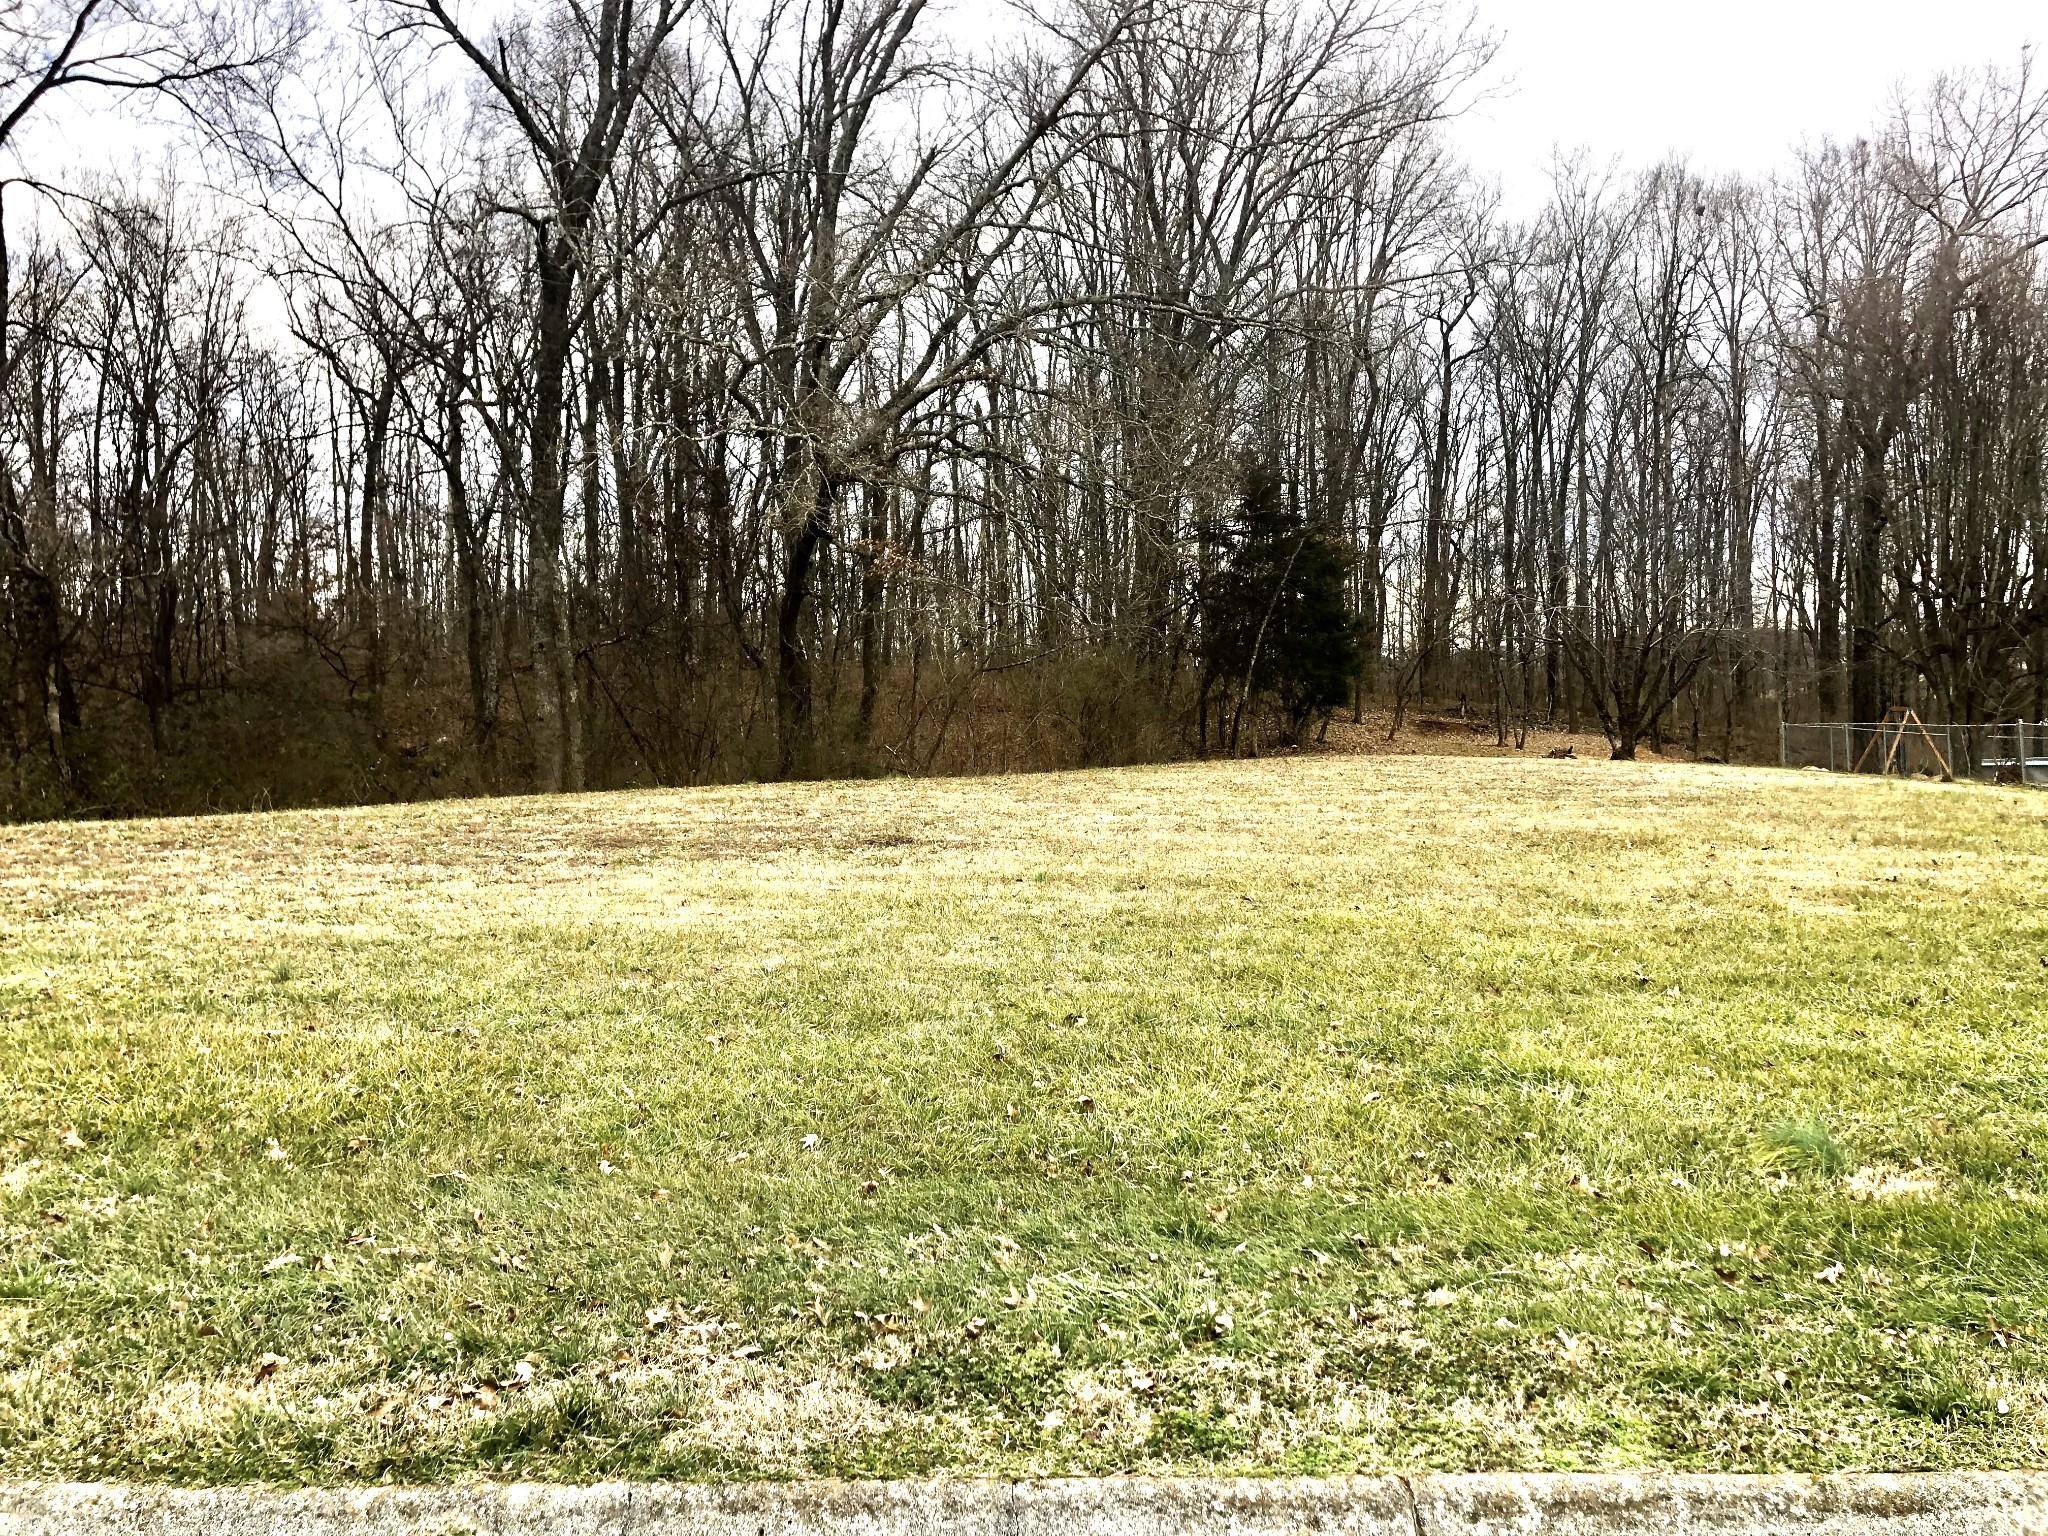 0 Clinch Vw Cir Property Photo - Jefferson City, TN real estate listing